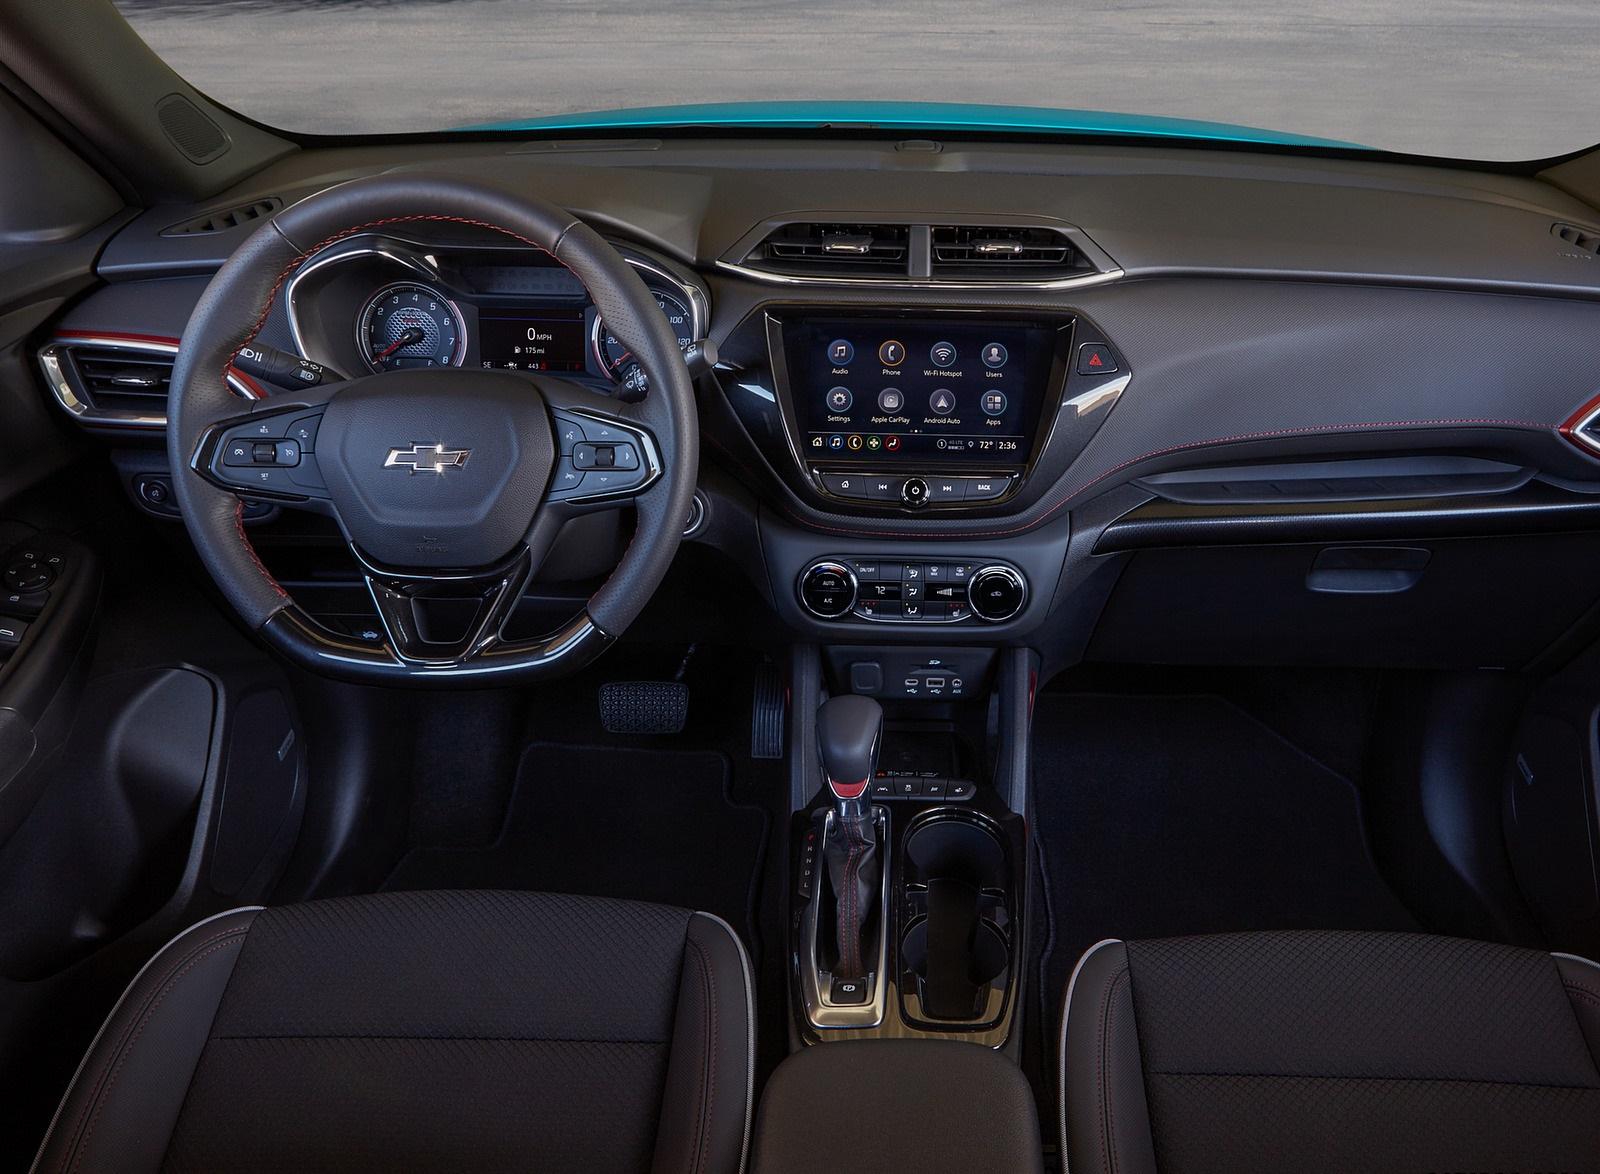 2021 Chevrolet Trailblazer RS Interior Cockpit Wallpapers (8)